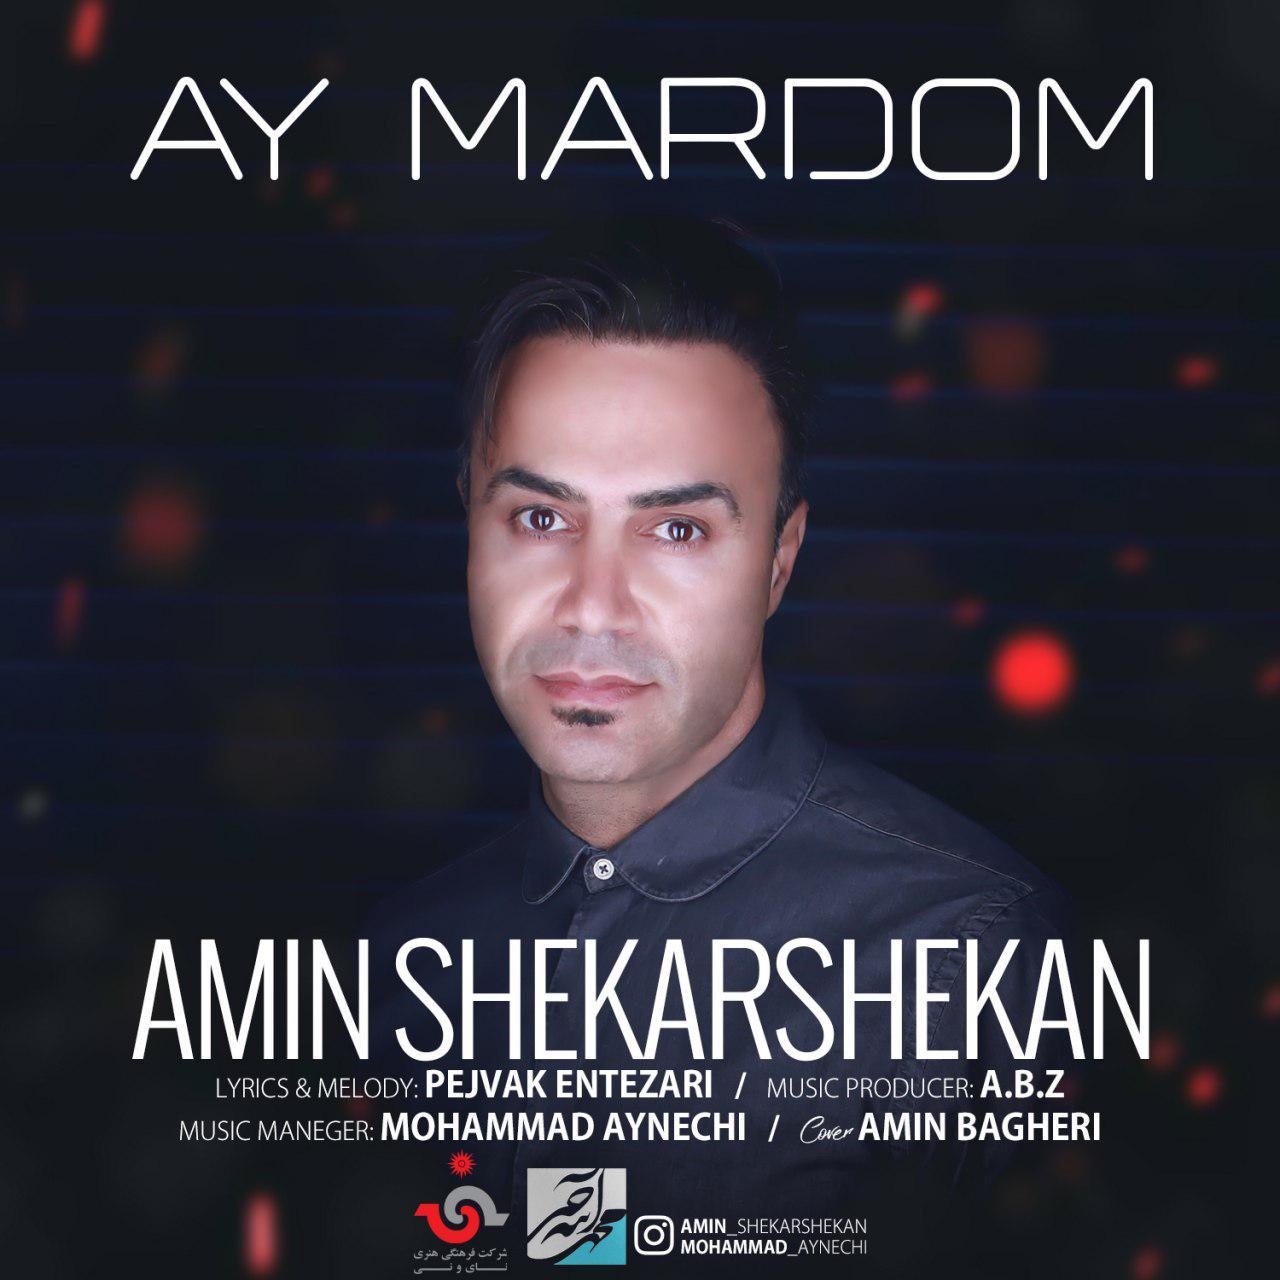 Amin ShekarShekan – Ay Mardom